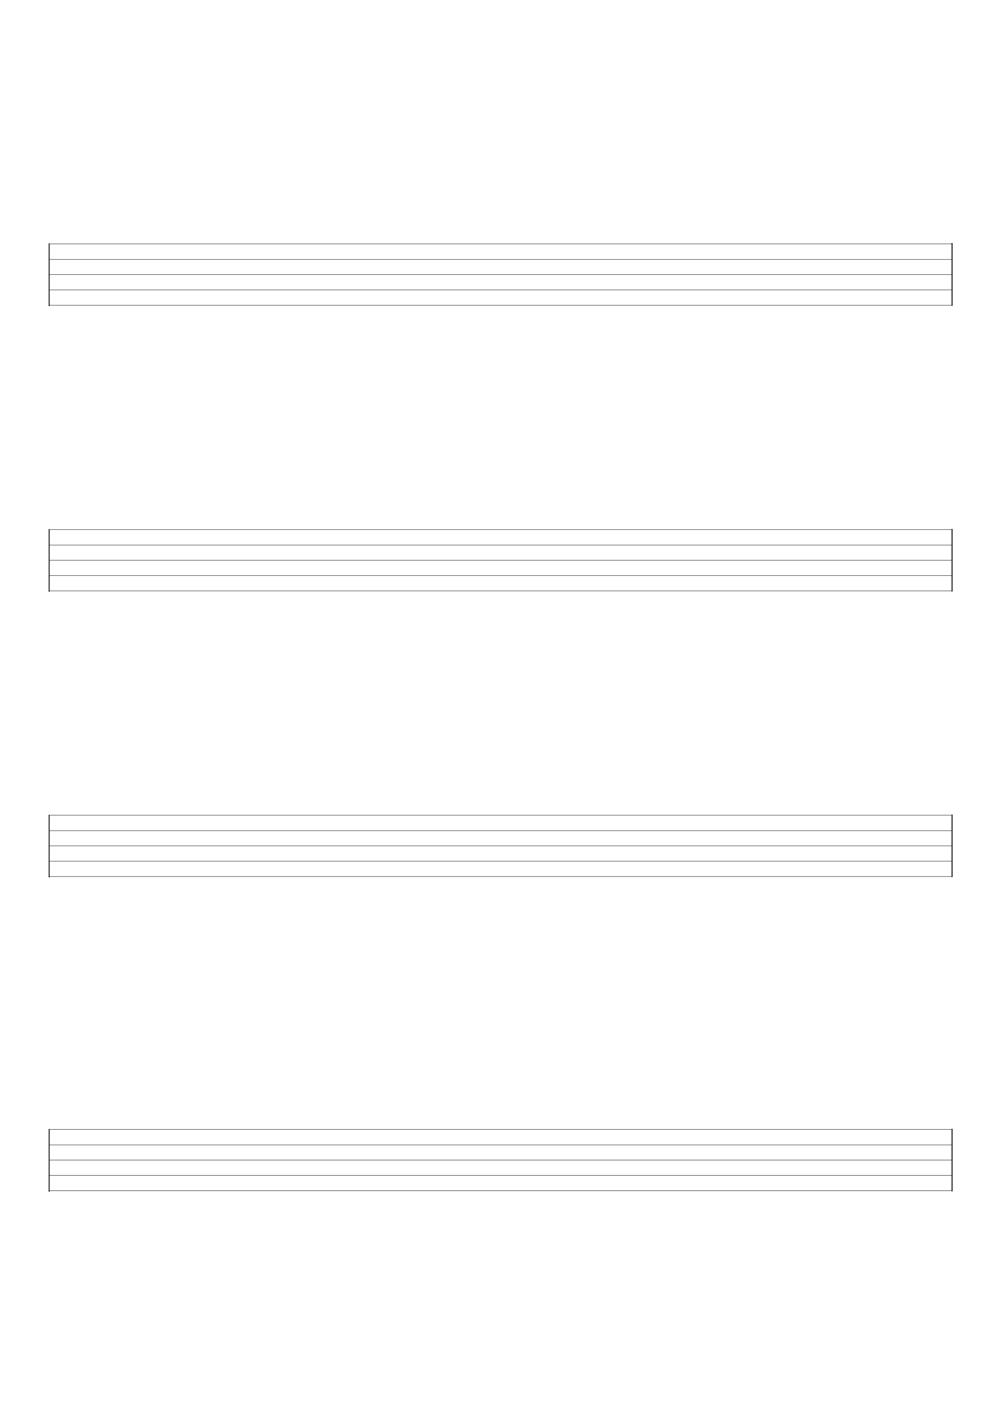 Notenpapier · 4 Systeme